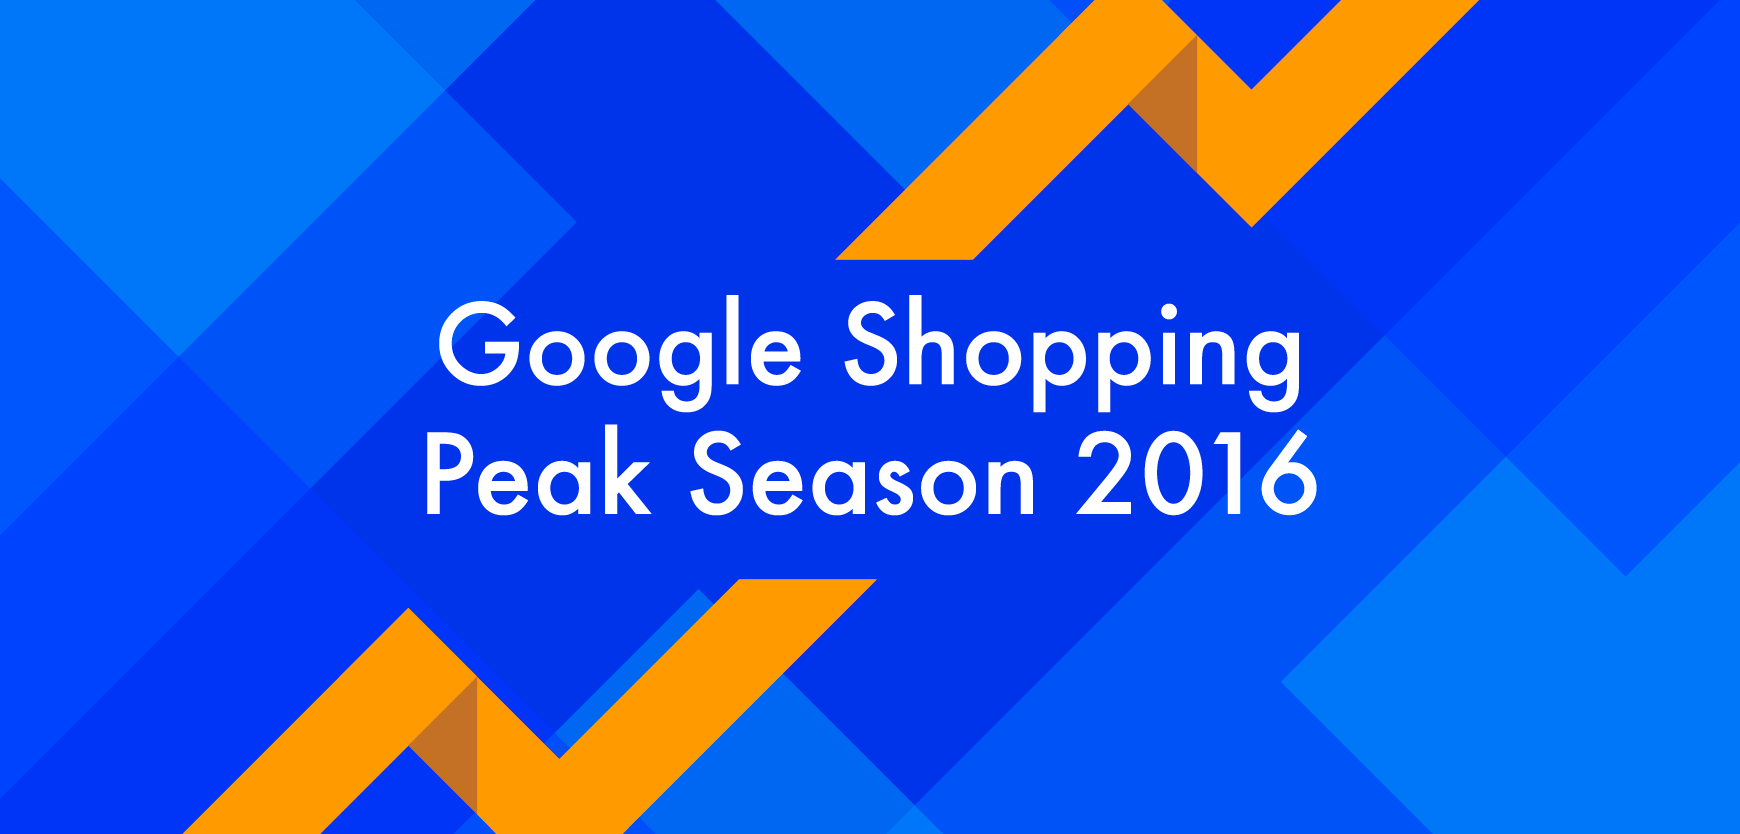 Google shopping headline